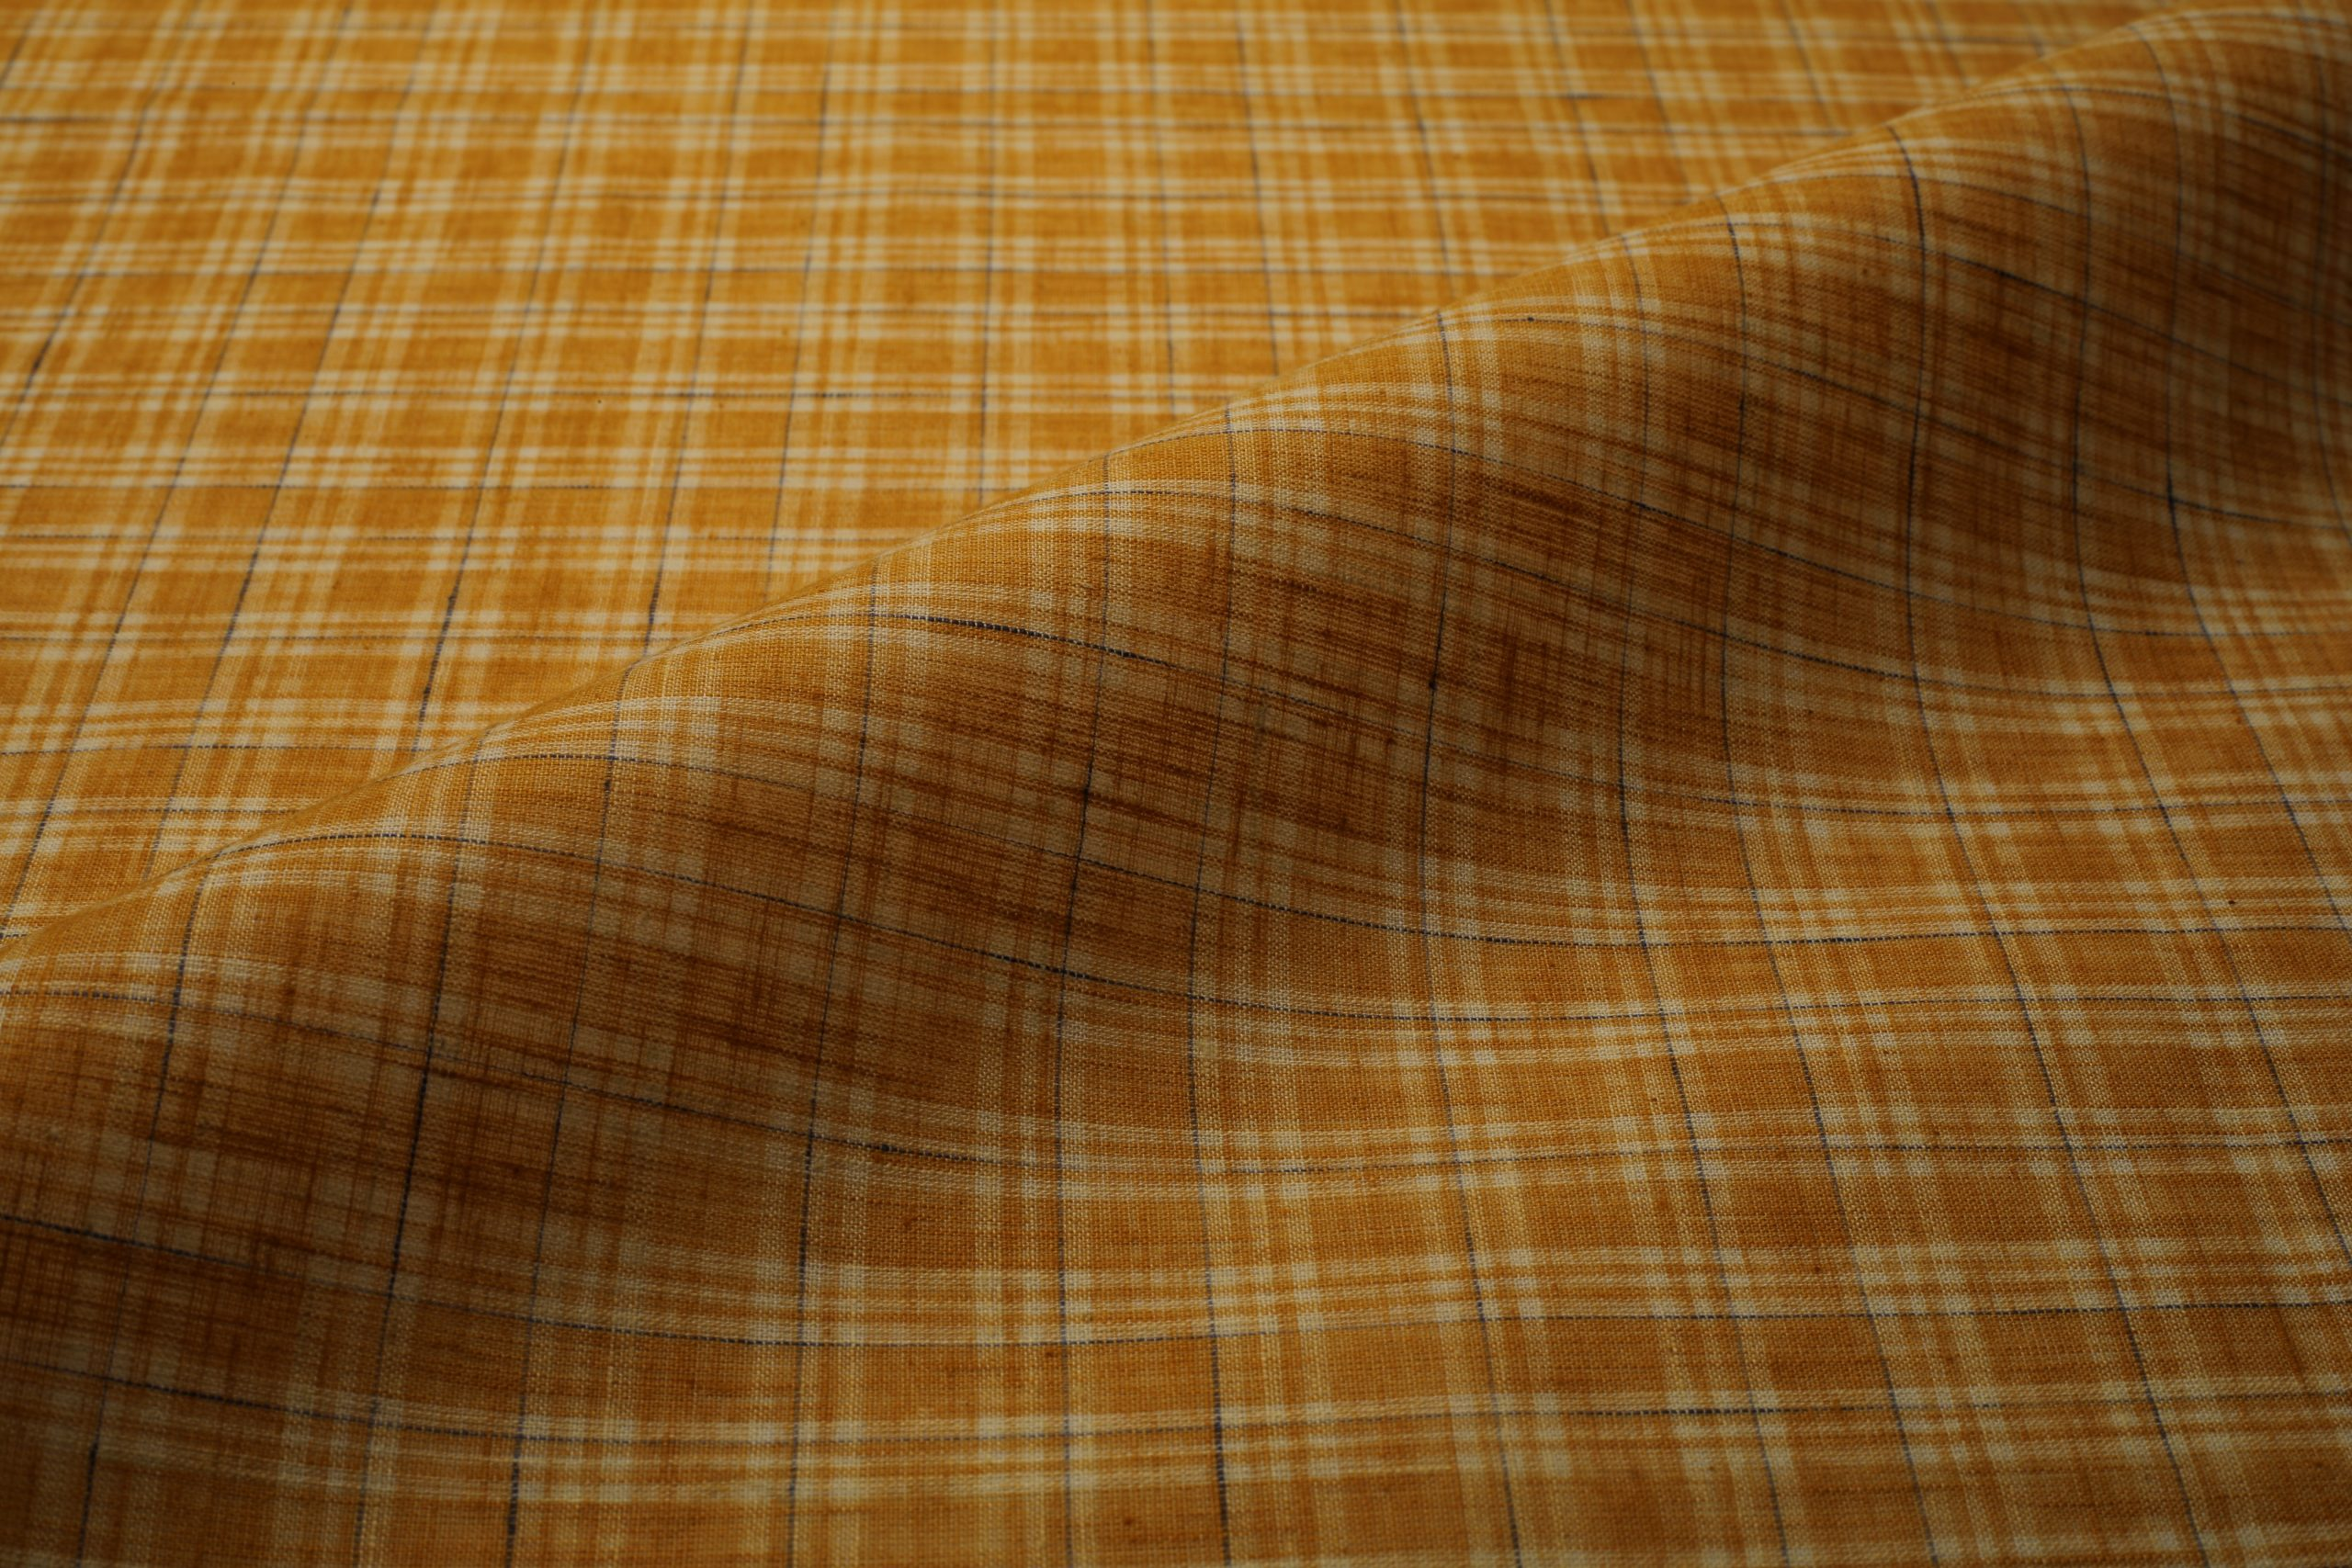 pc check shirt fabric